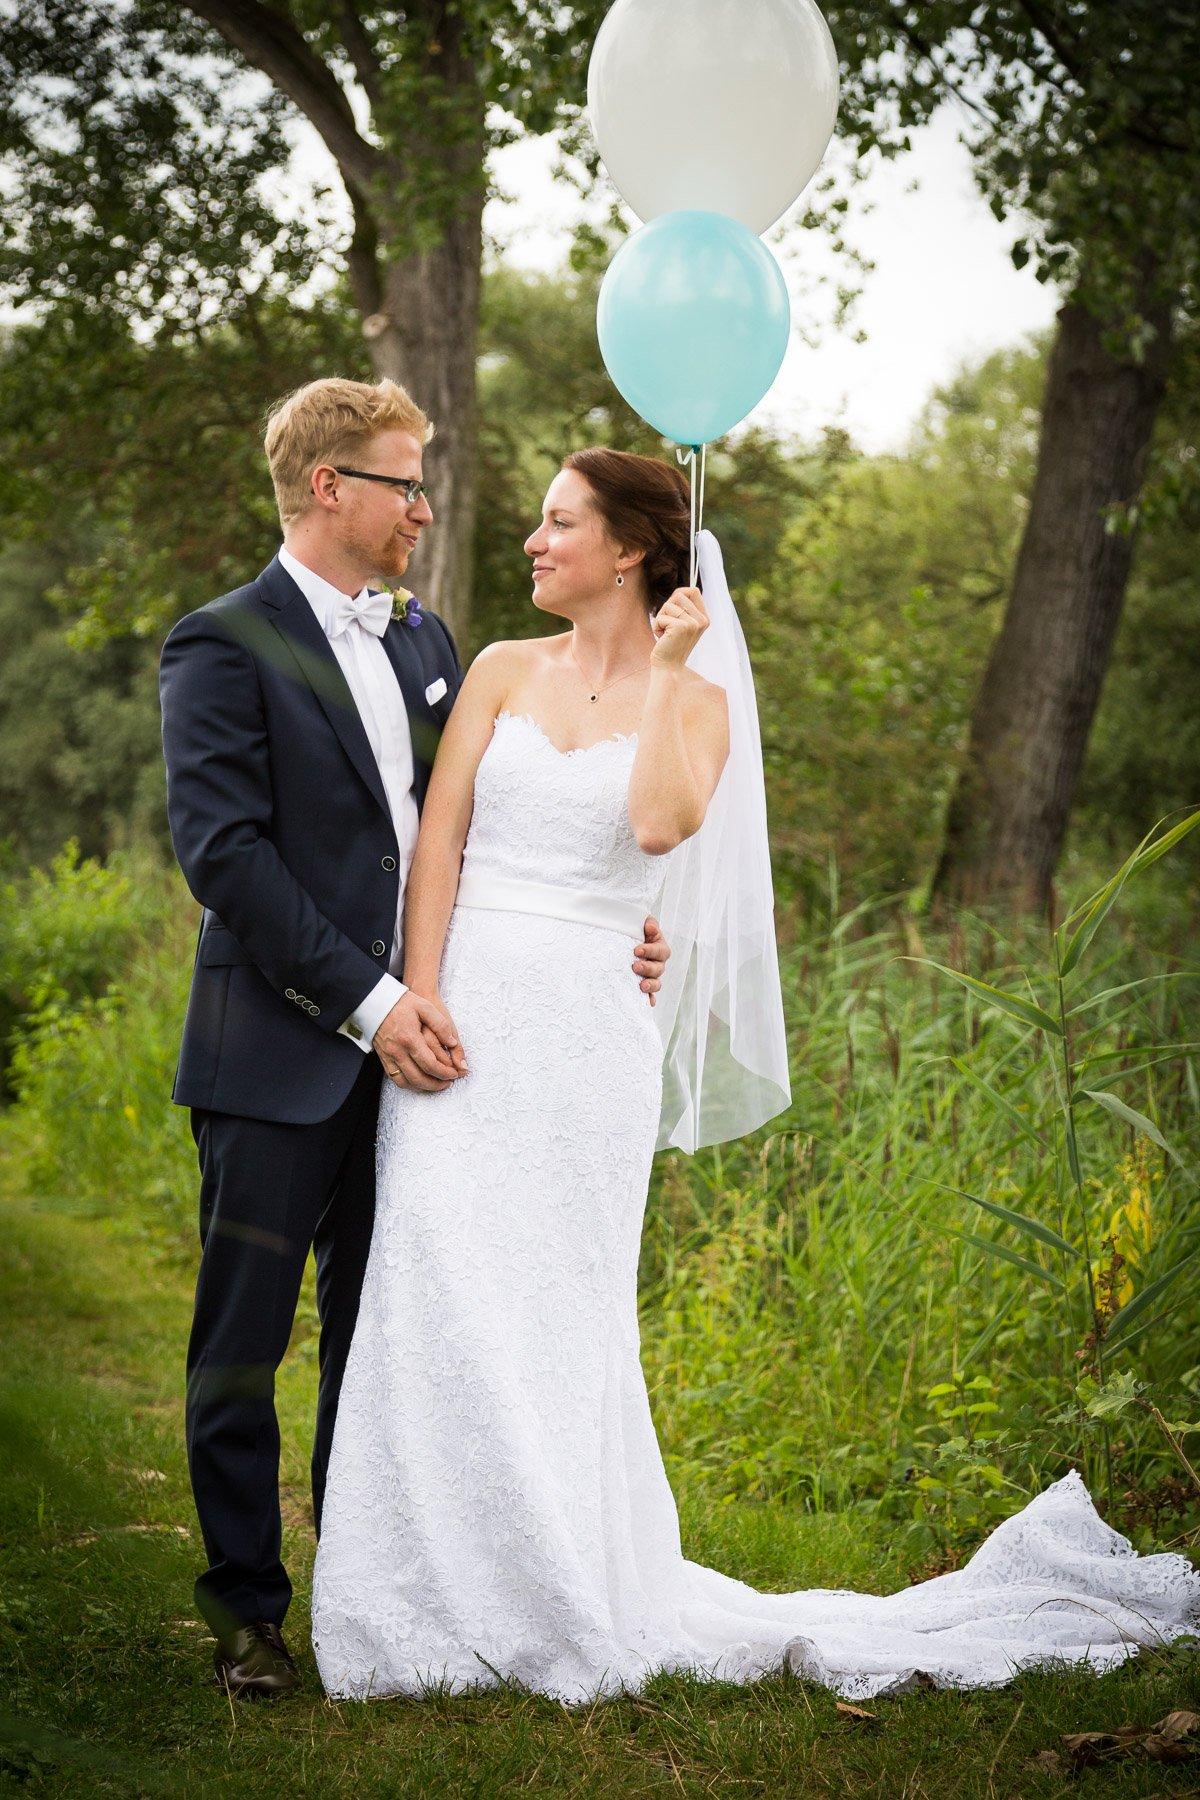 Brautpaarshooting in Hannover